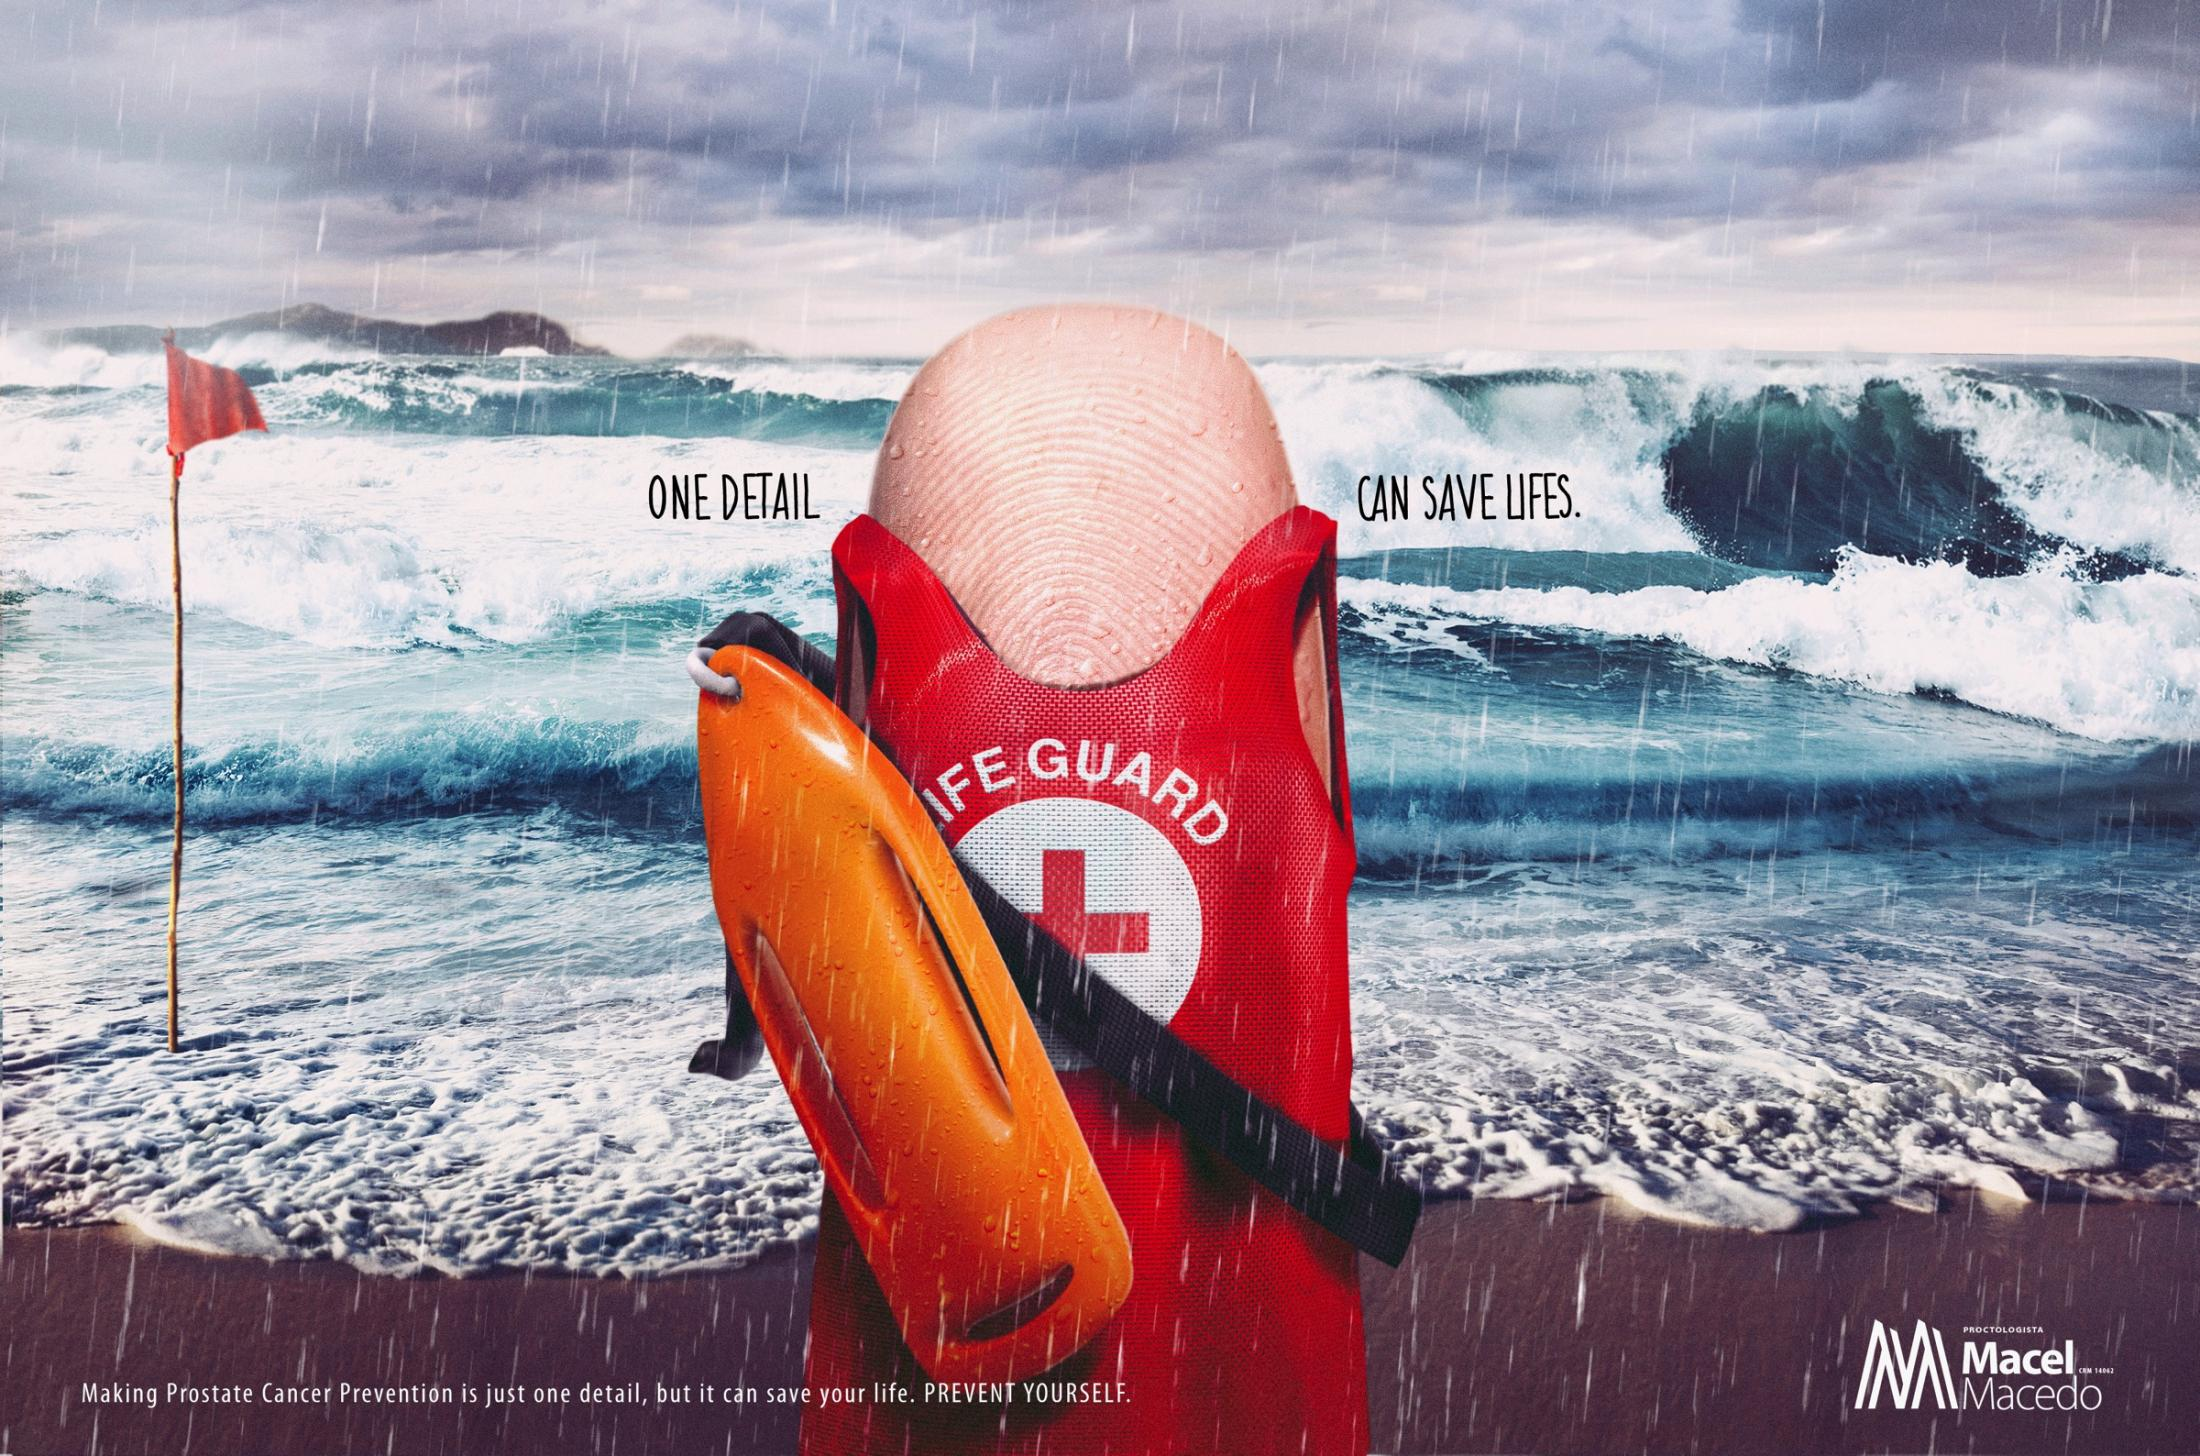 Doctor Macel Macedo Print Ad - Lifeguard